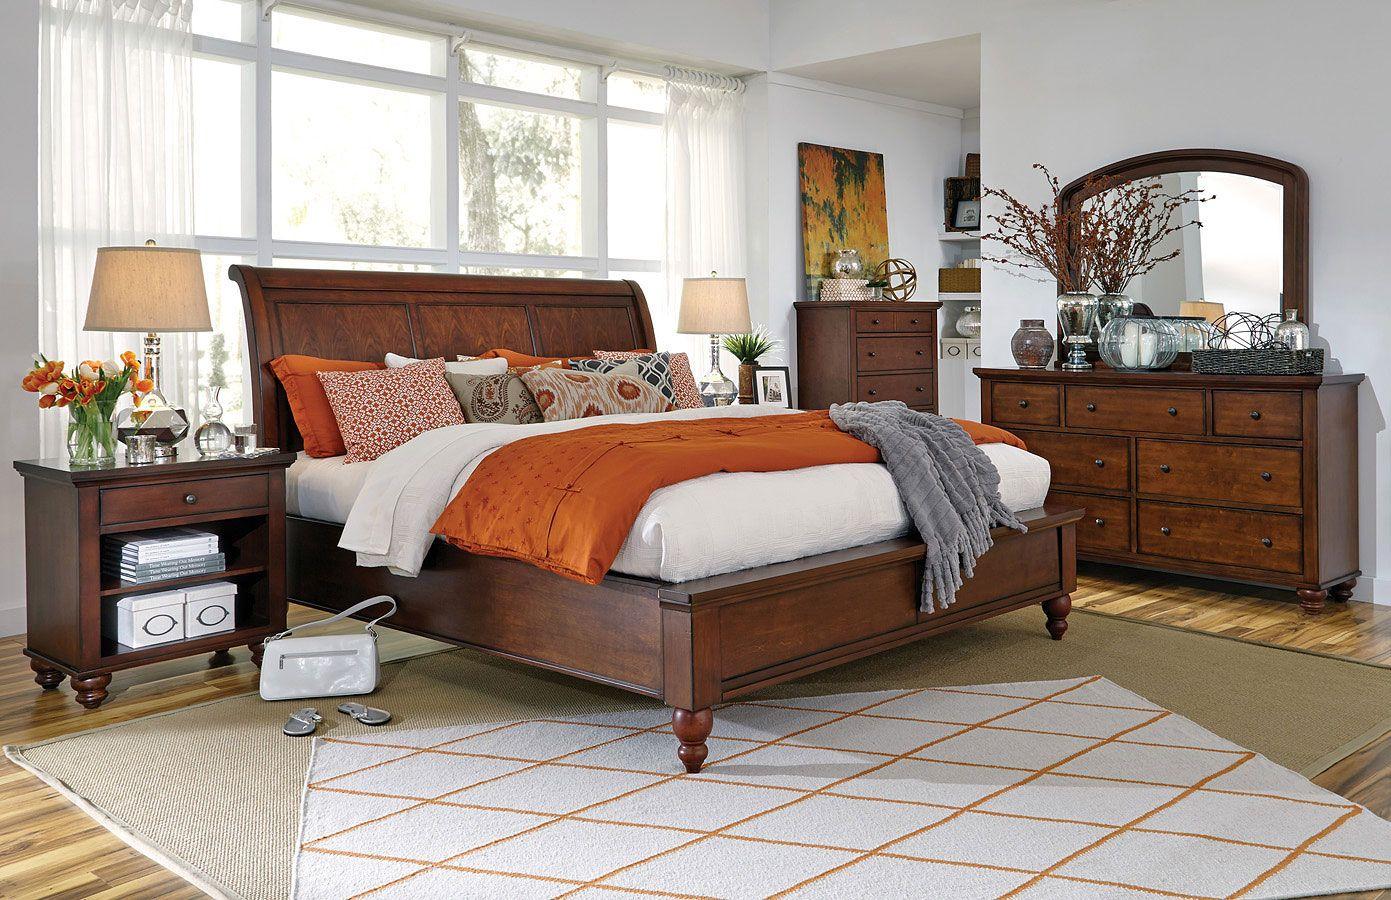 Cambridge sleigh bedroom set brown cherry furniture